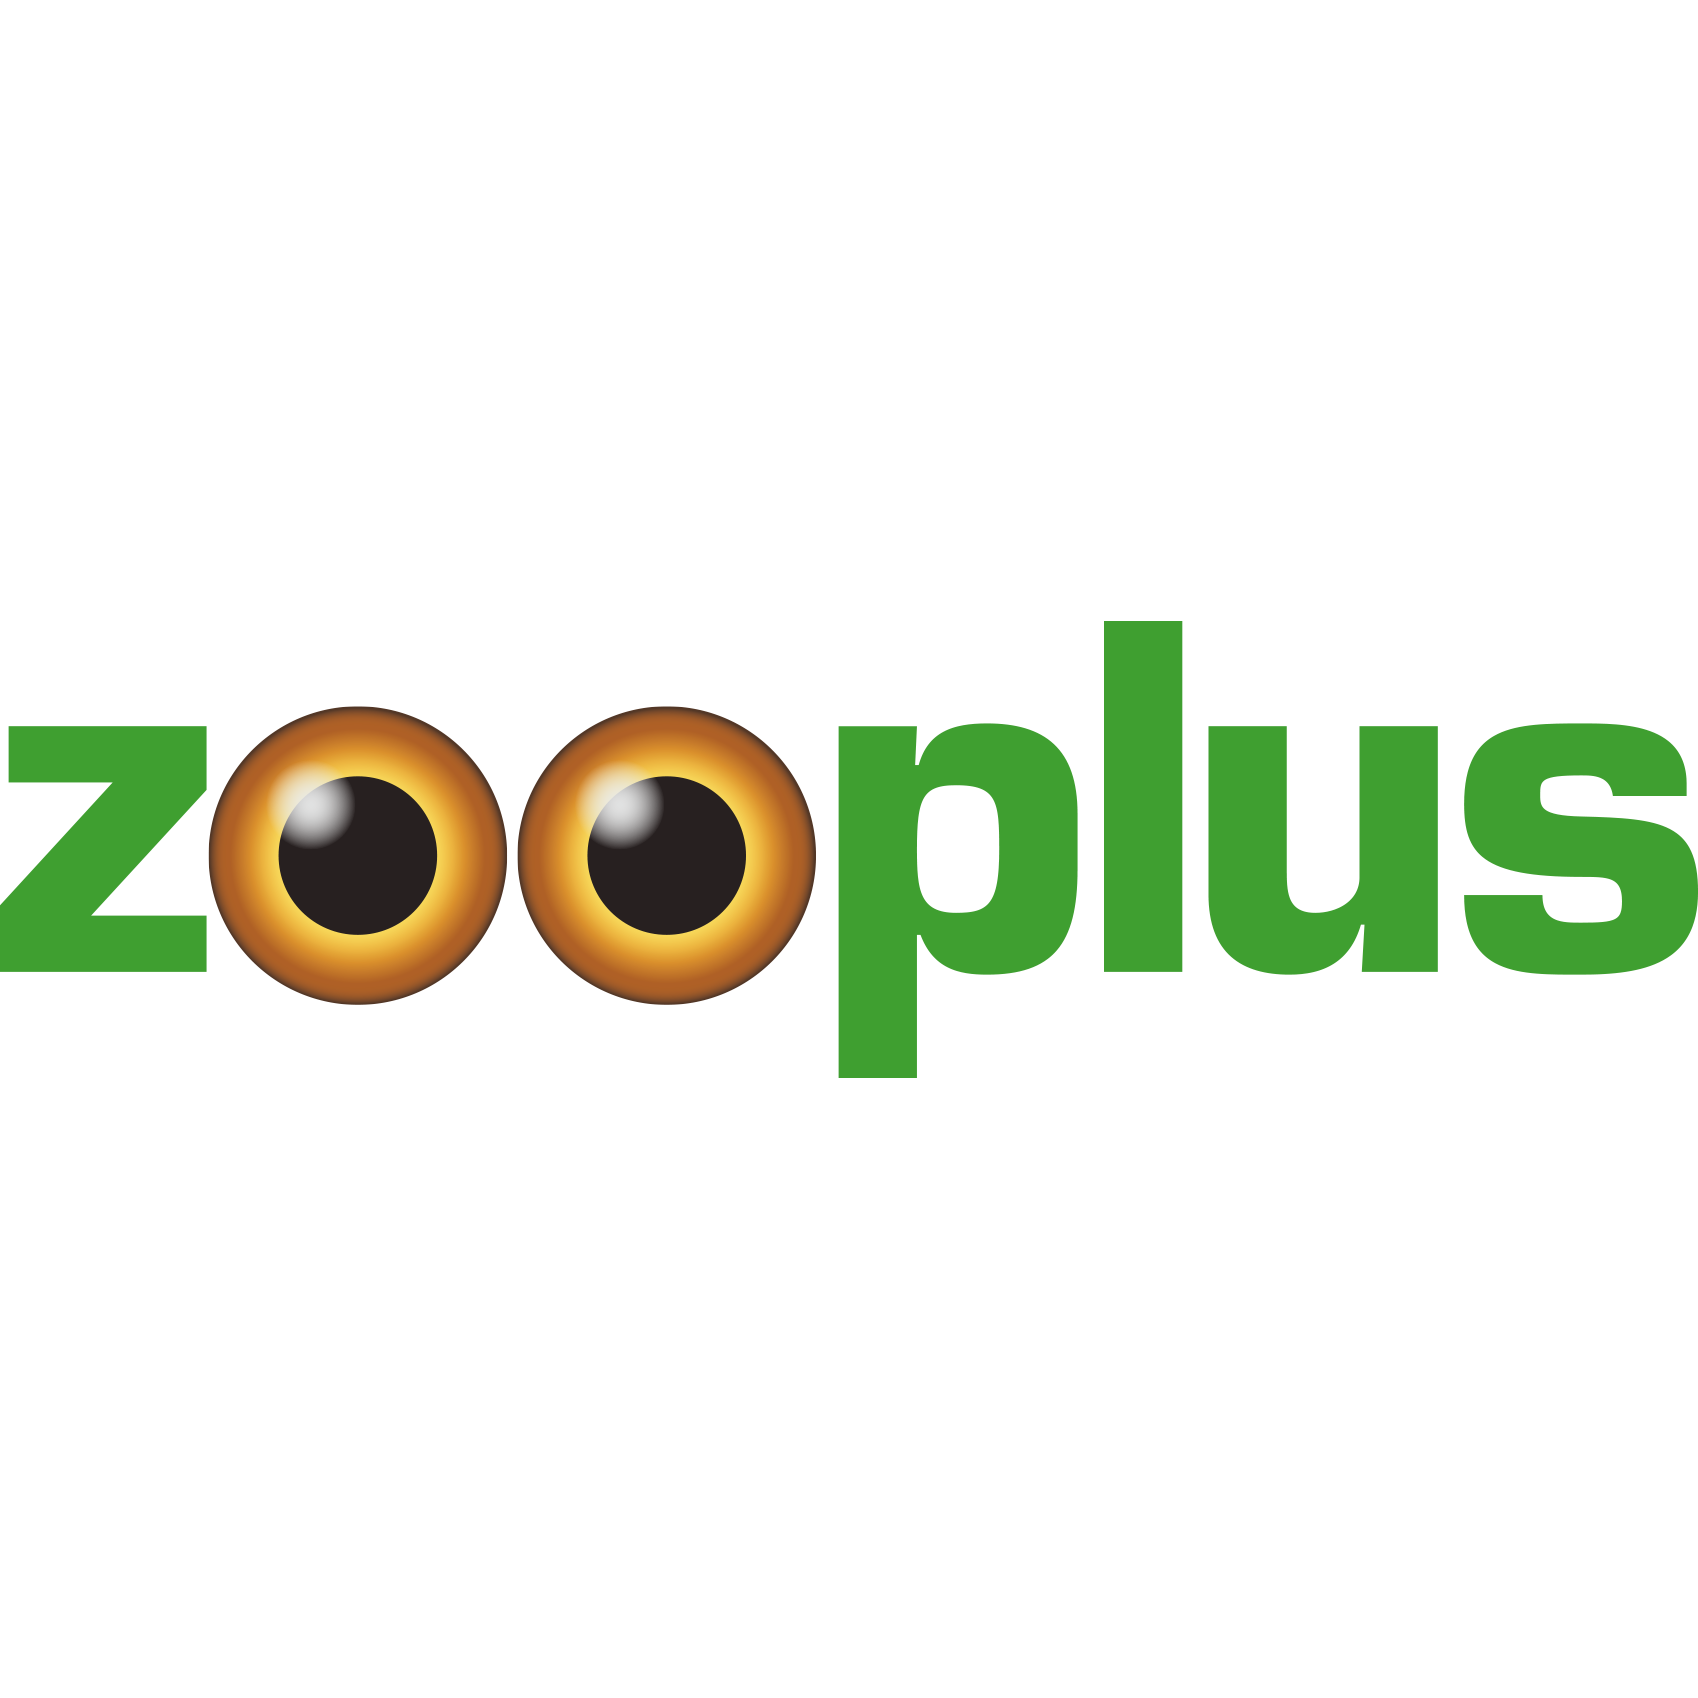 zooplus_logo_CMYK